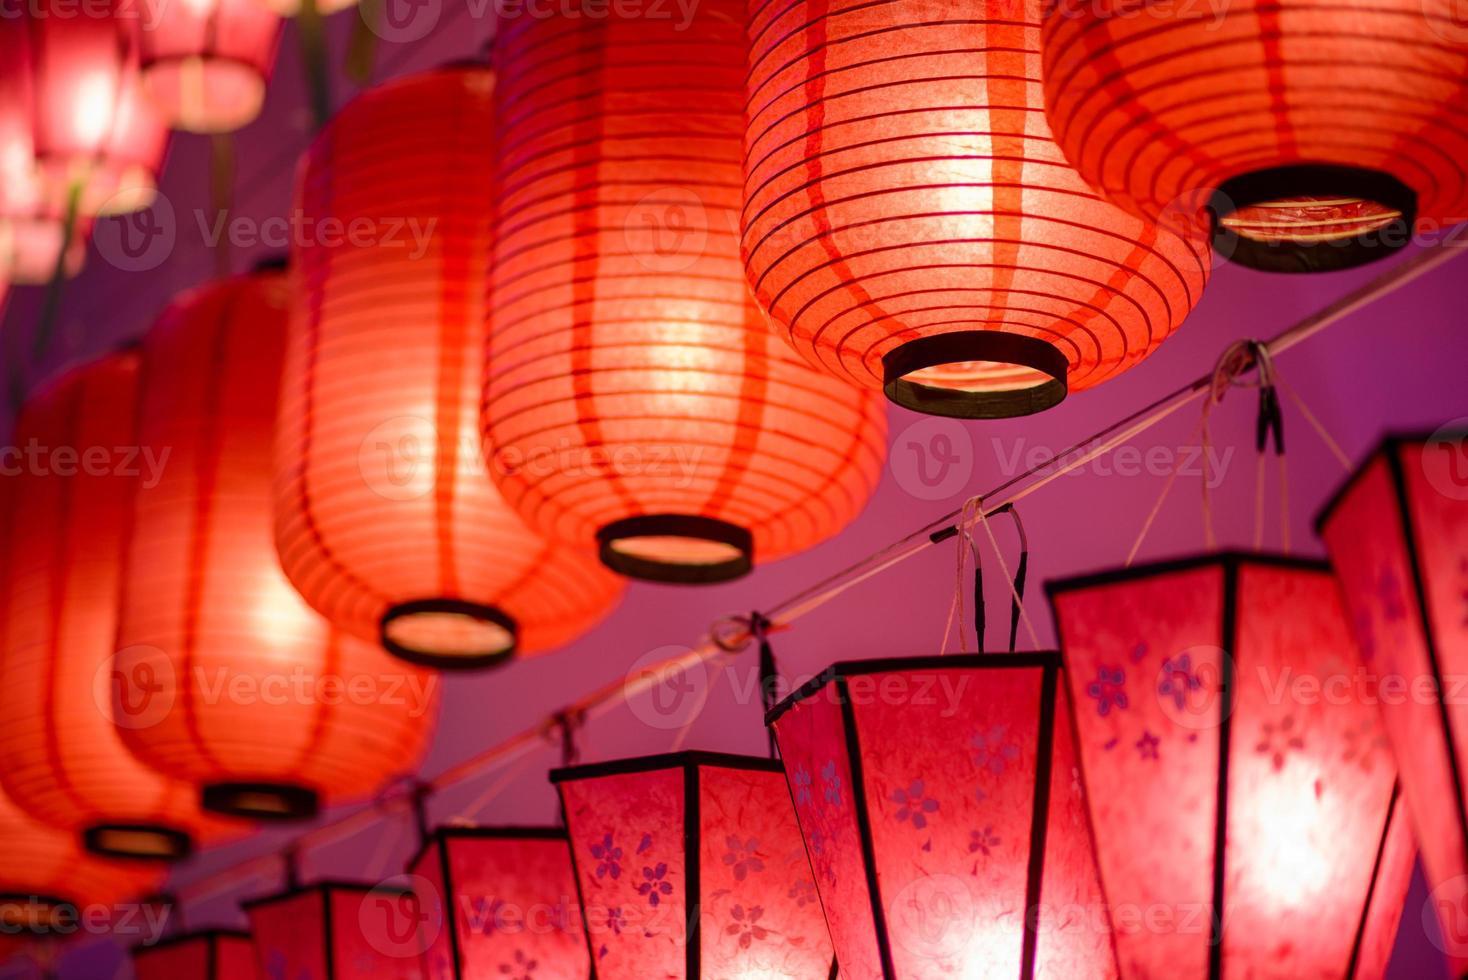 kleurrijke internationale lantaarns foto